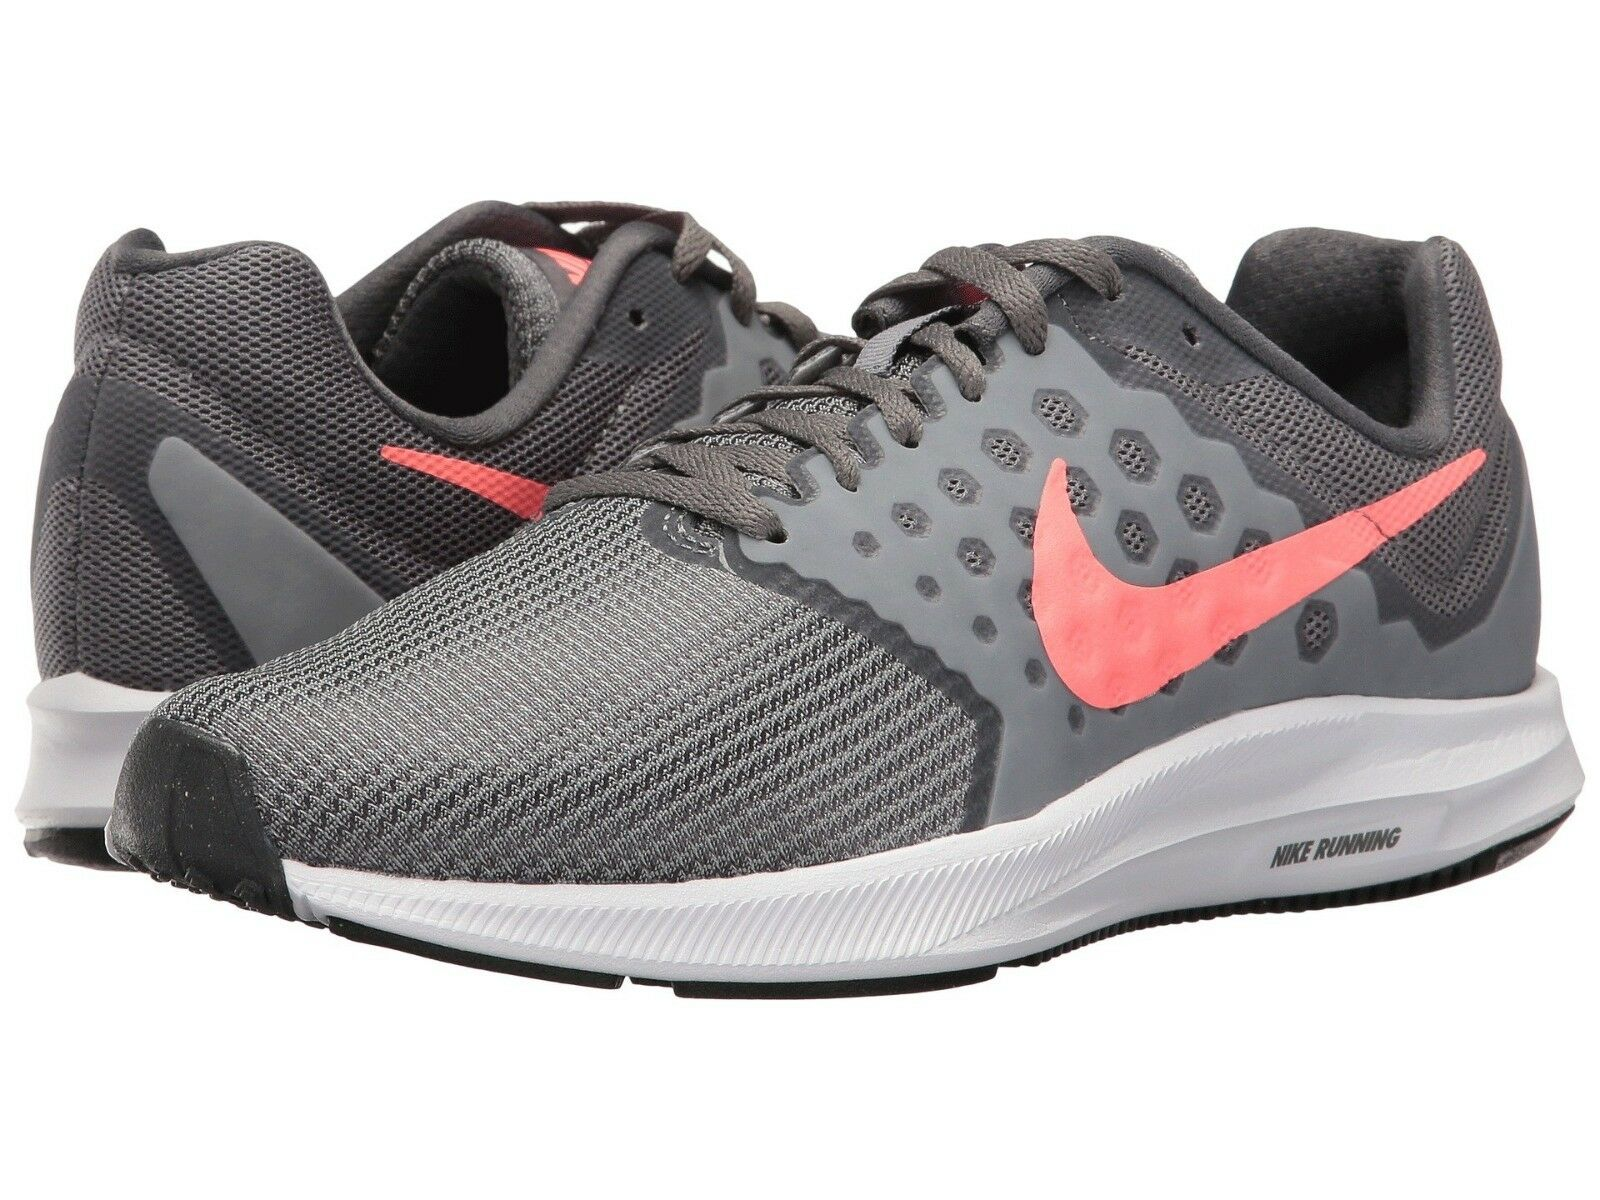 Neu in Box Damen Nike Downshifter 7 Laufschuhe Mittlere und 2E Breit Revolution